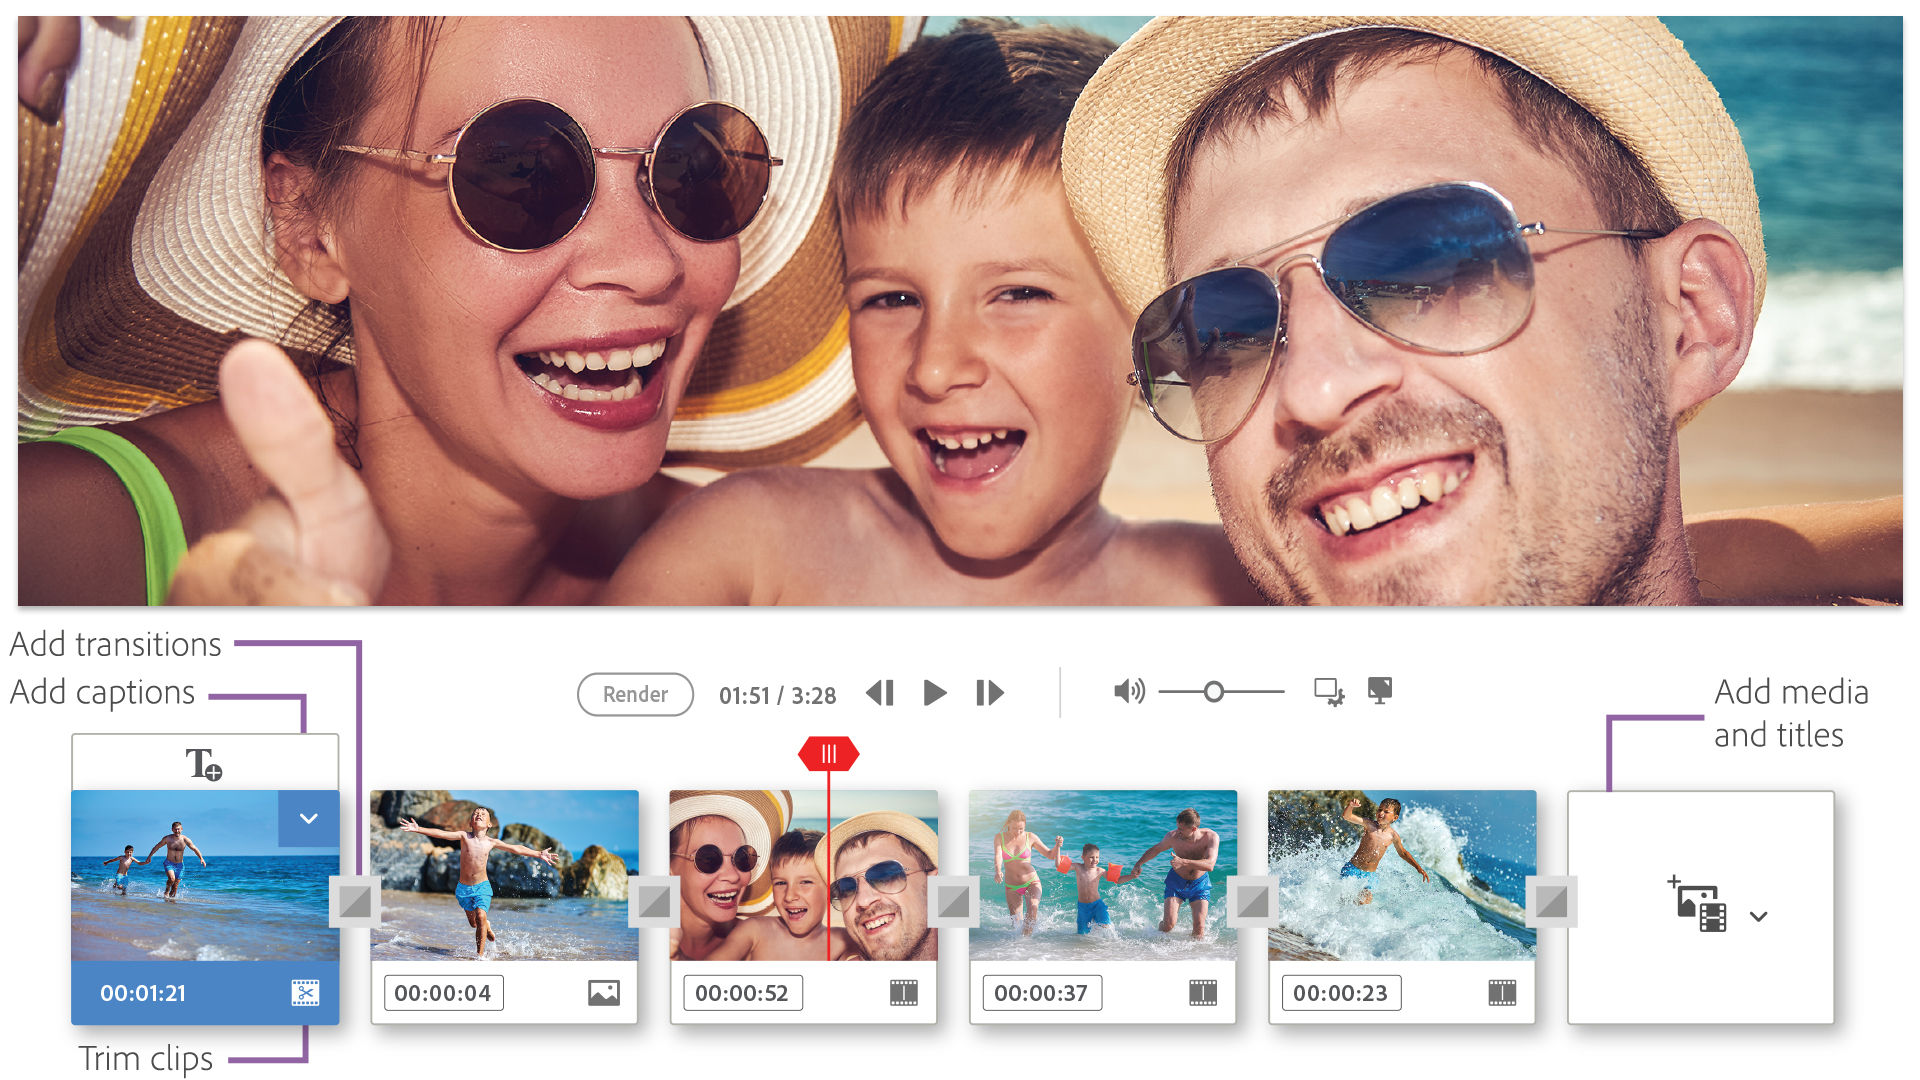 Adobe Photoshop Elements 10 precio barato